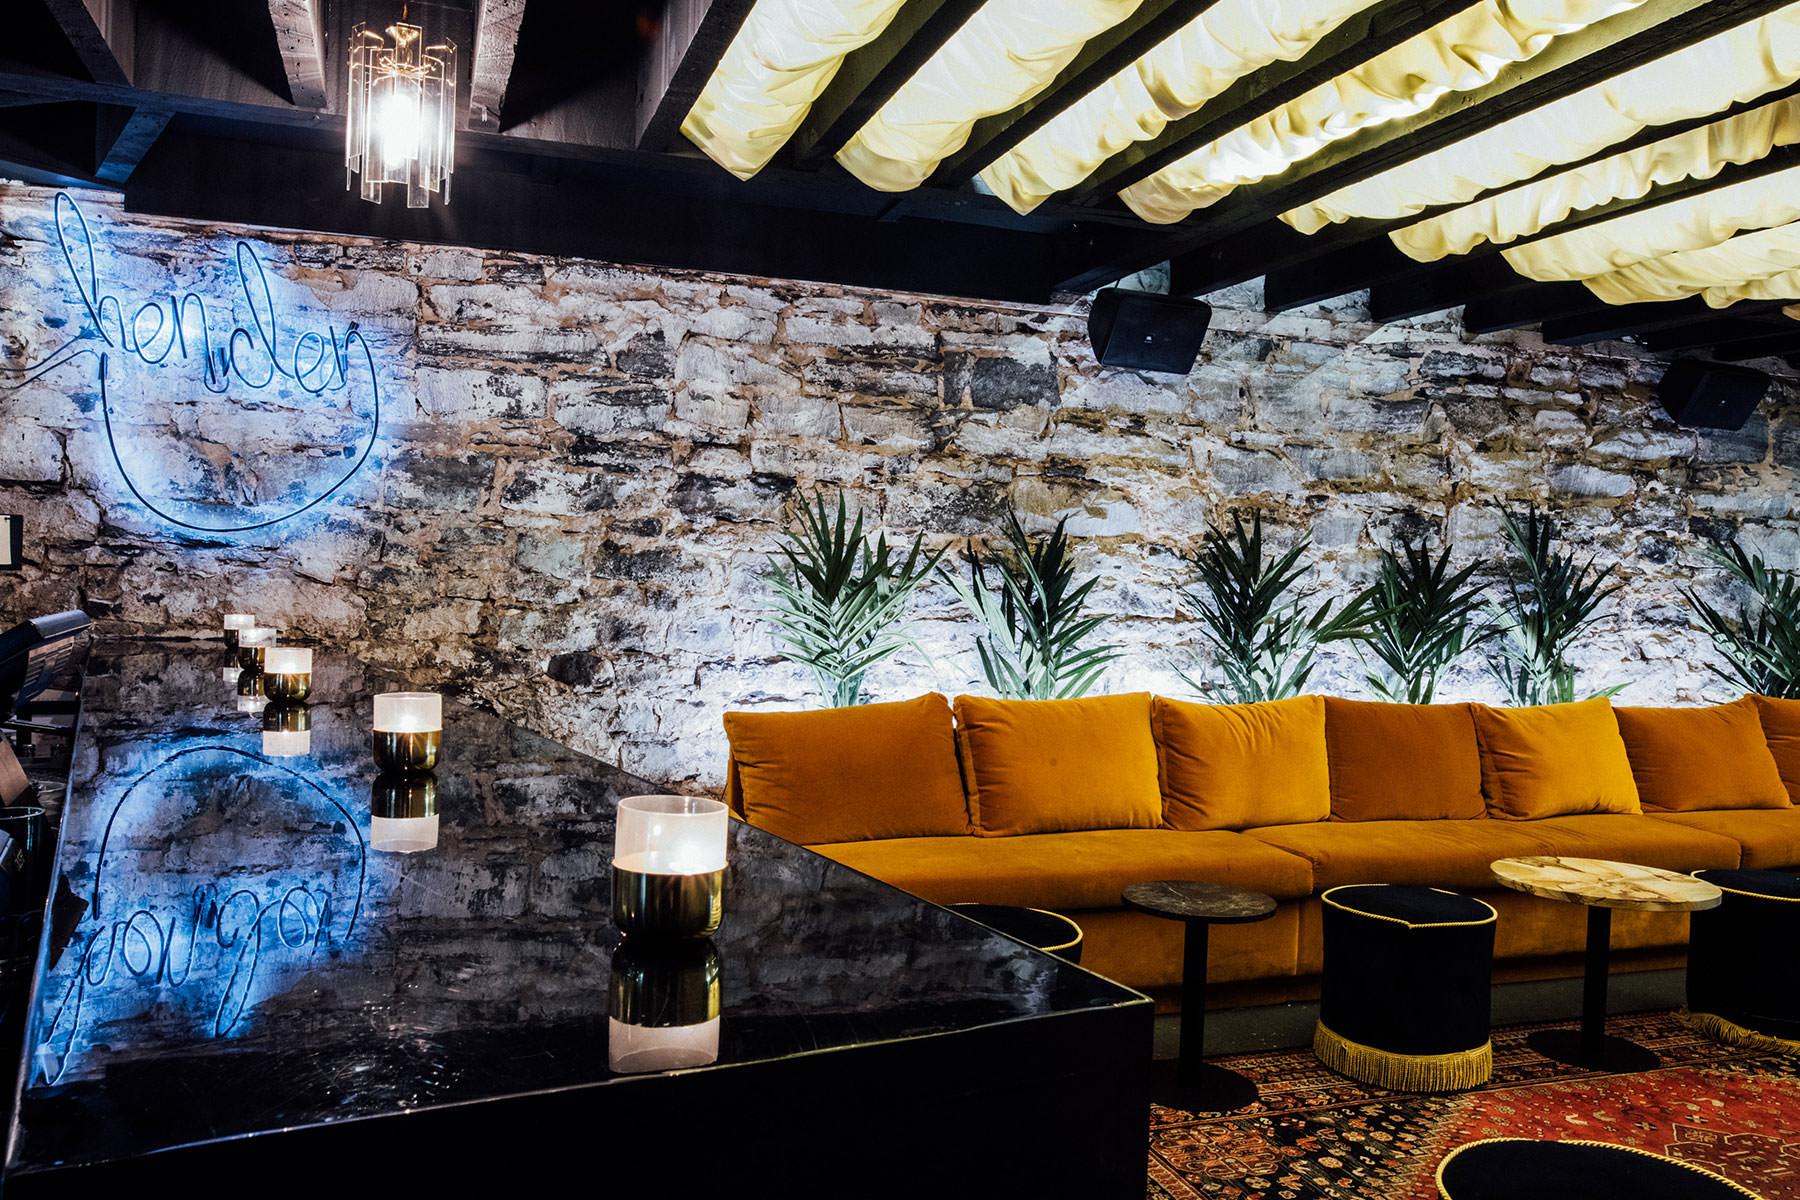 10 speakeasy bars to discover across Canada